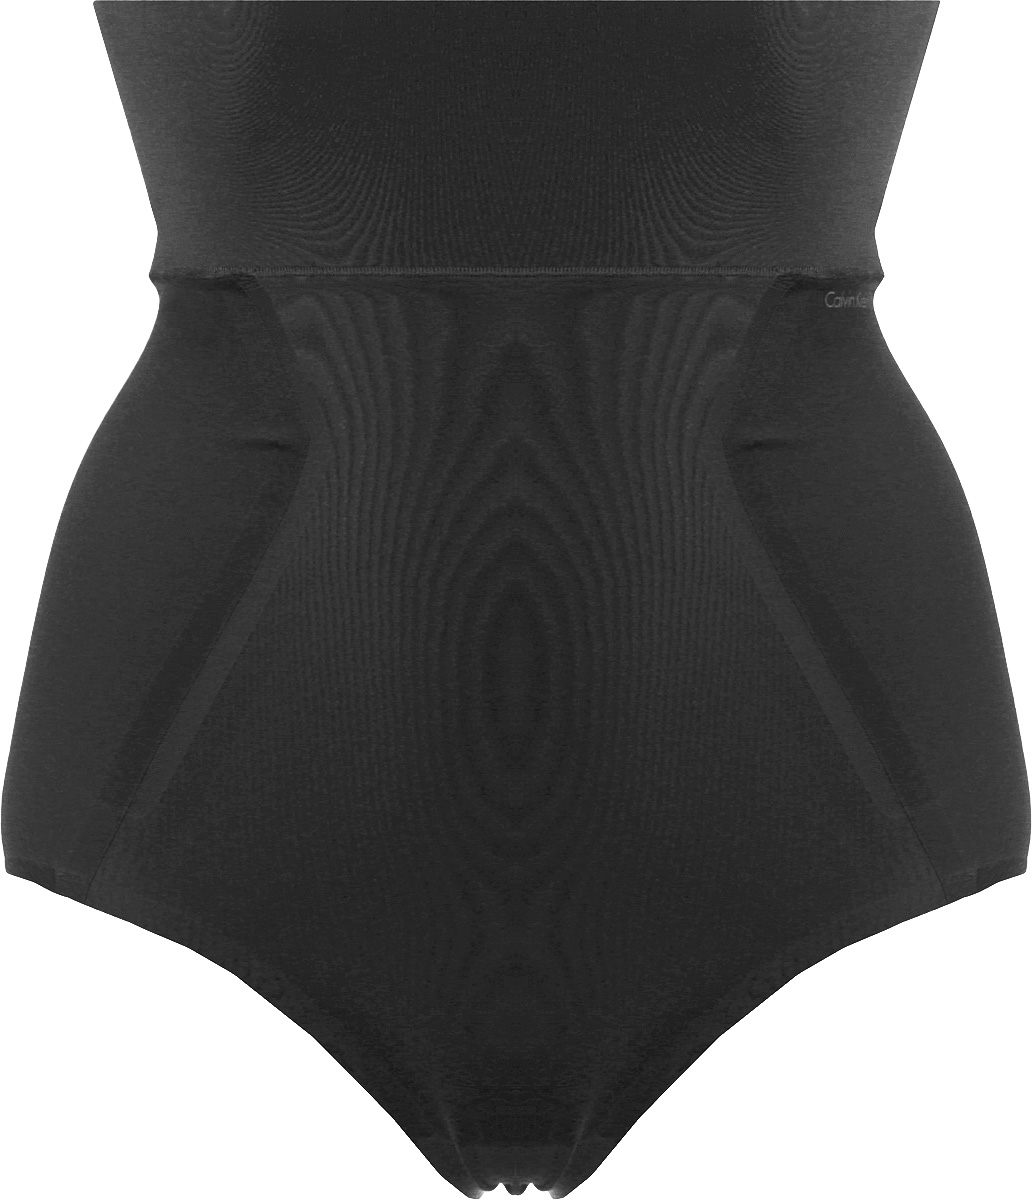 Трусы женские Calvin Klein Underwear, цвет: черный. QF4263E_001. Размер S (42) трусы женские calvin klein underwear цвет черный qf1950e 001 размер s 42